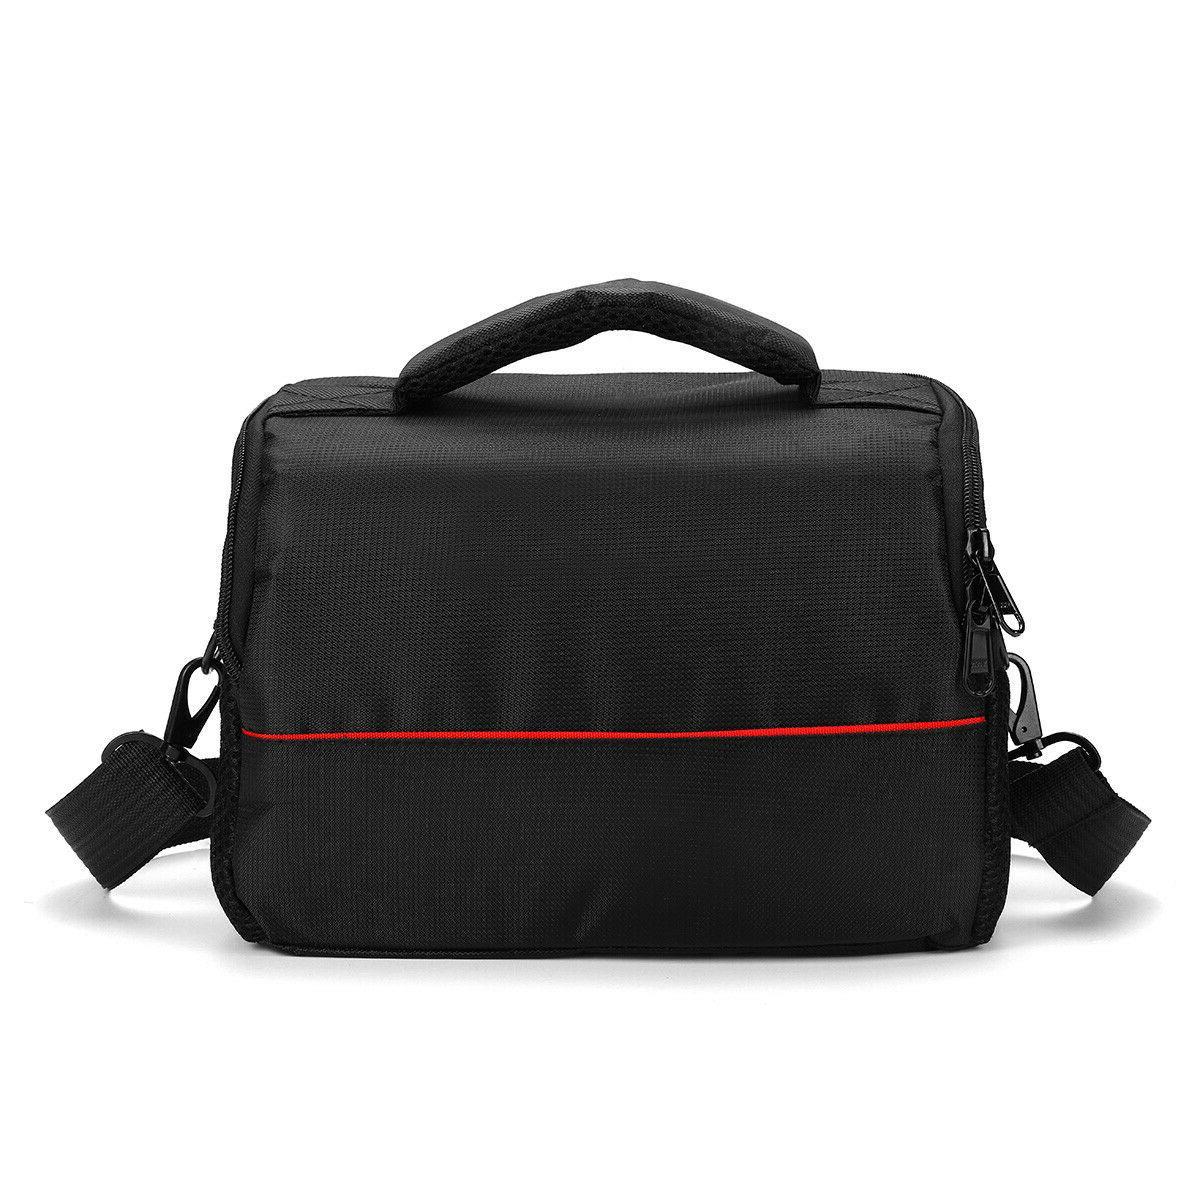 Digital Camera Bag Waterproof Canon Nikon DSLR